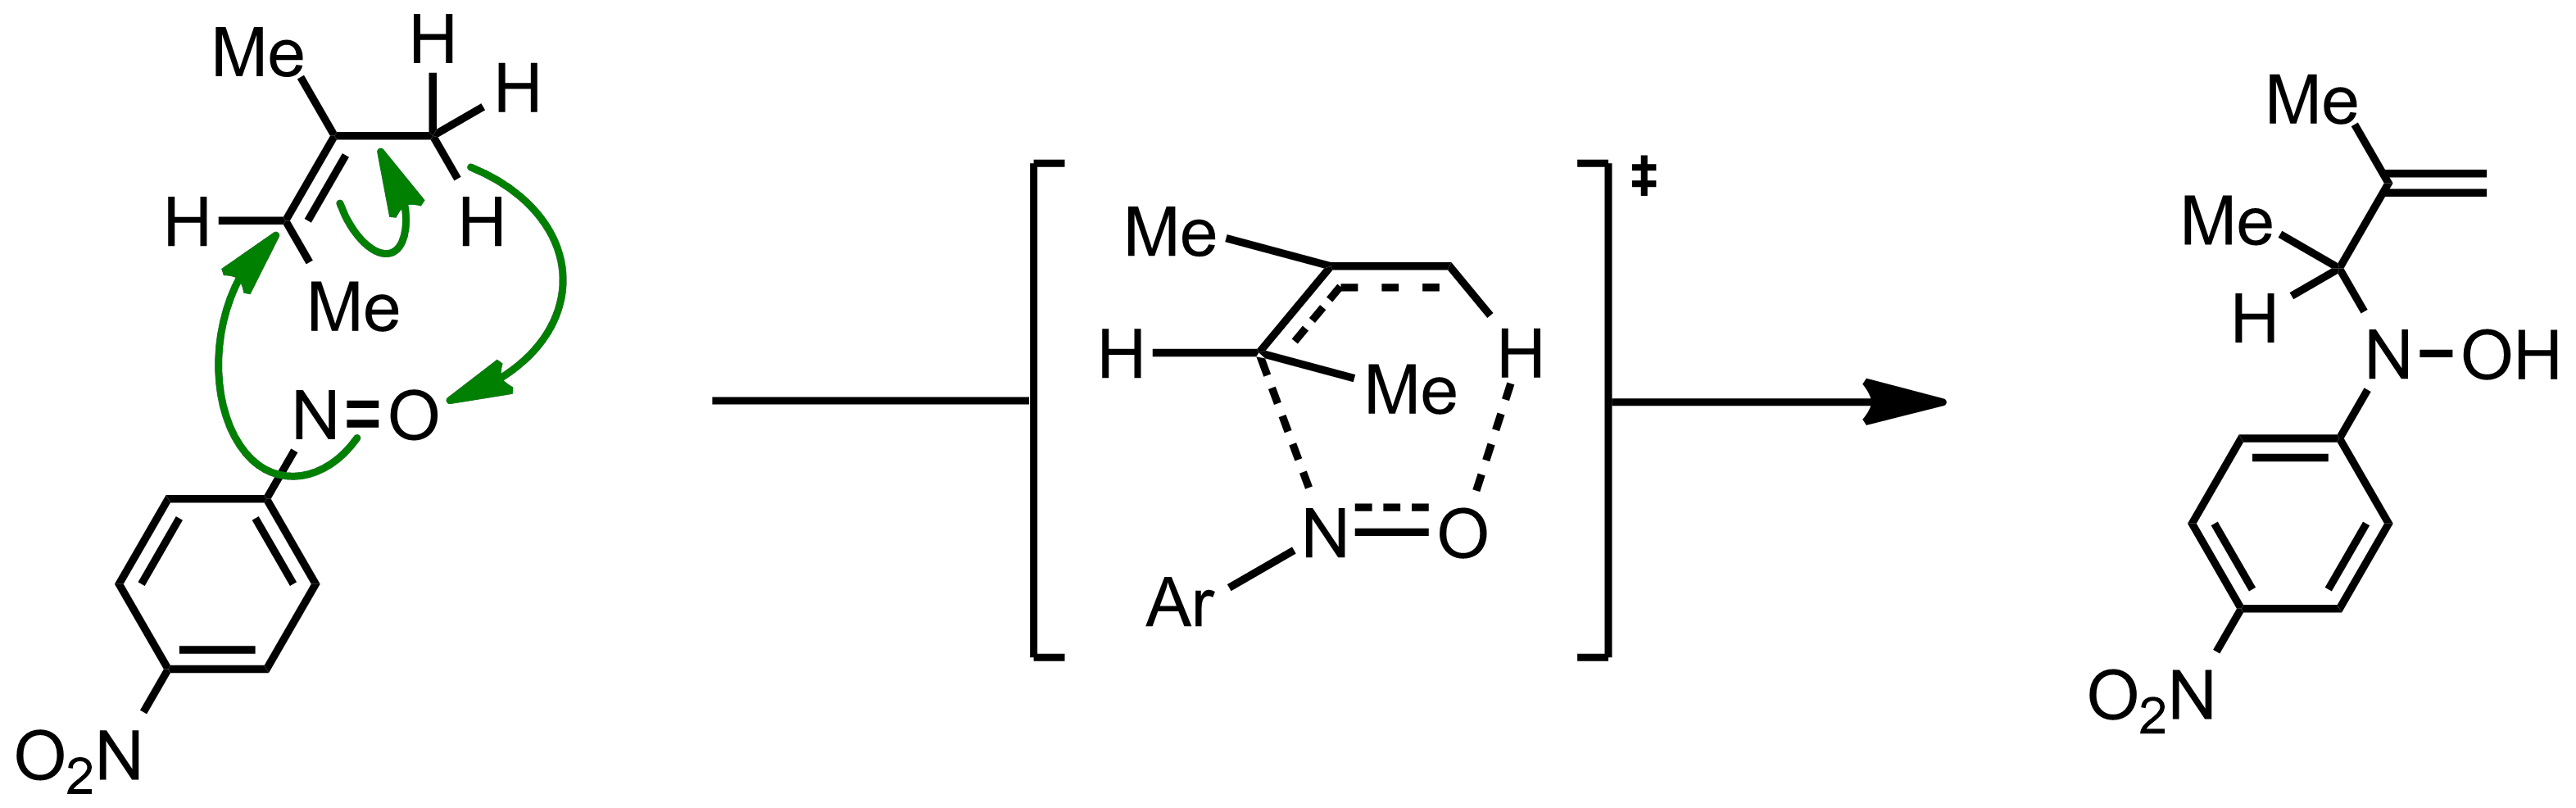 Mechanism of the Ene Reaction